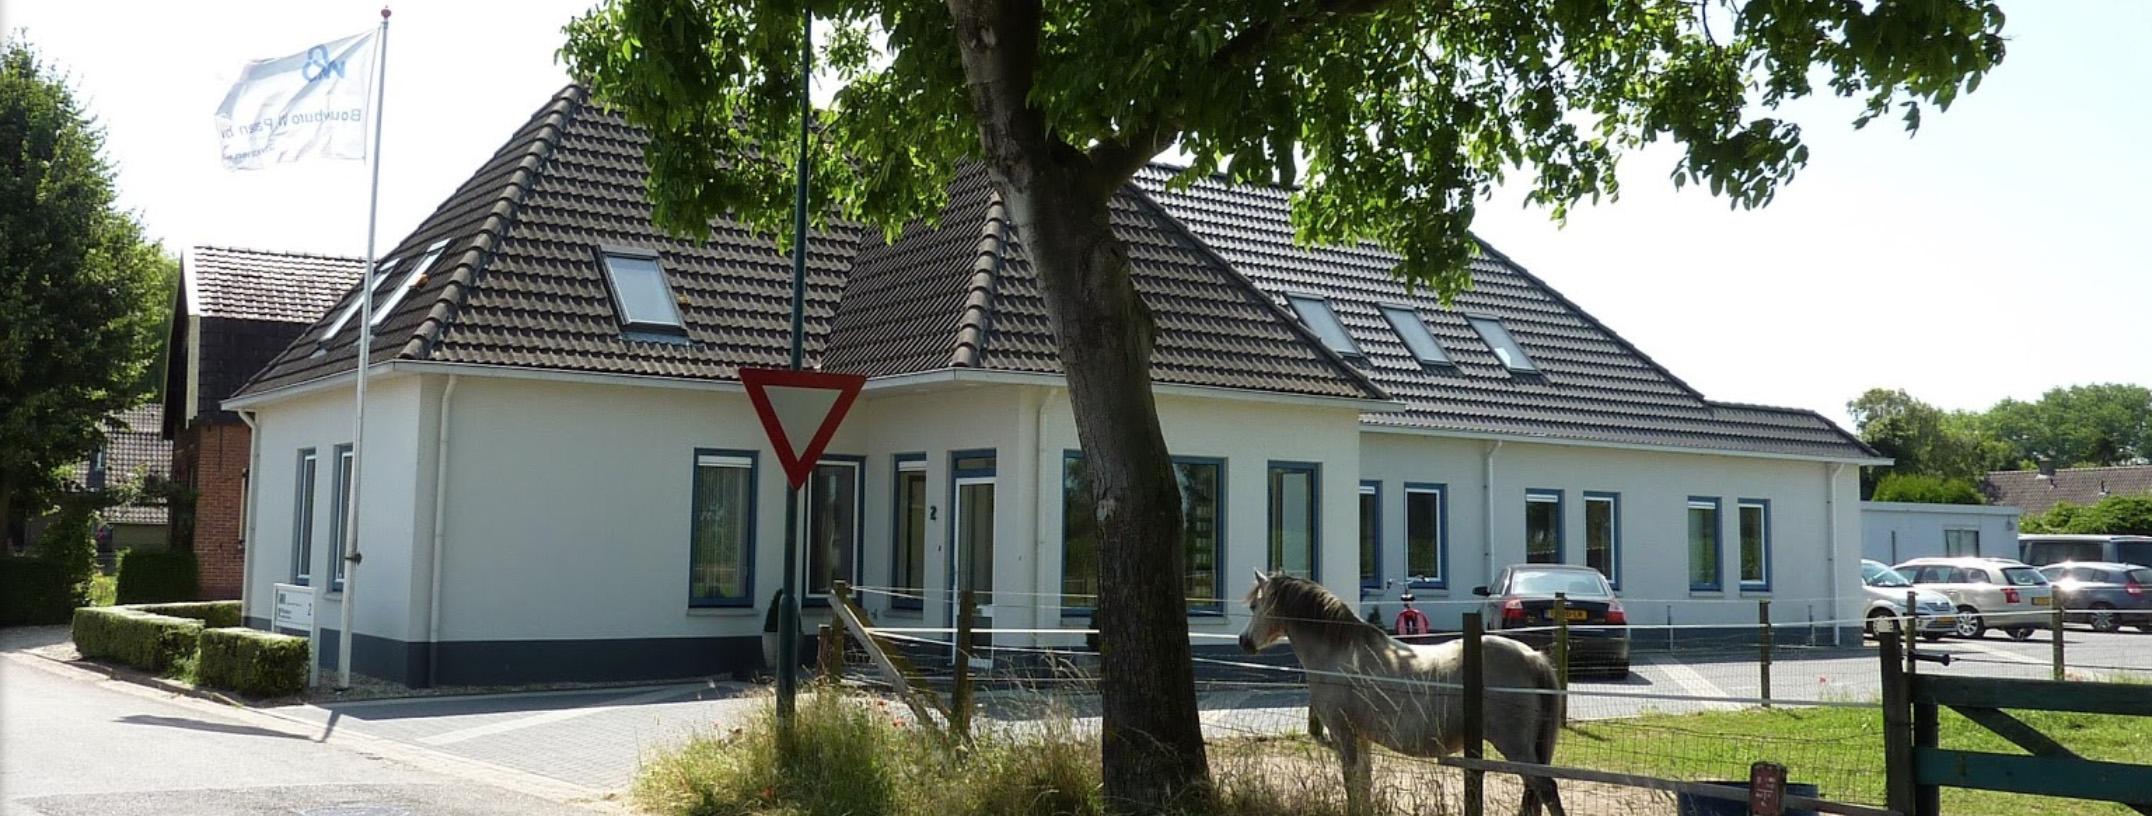 Kantoor_ammerzoden_bouwburo_panen